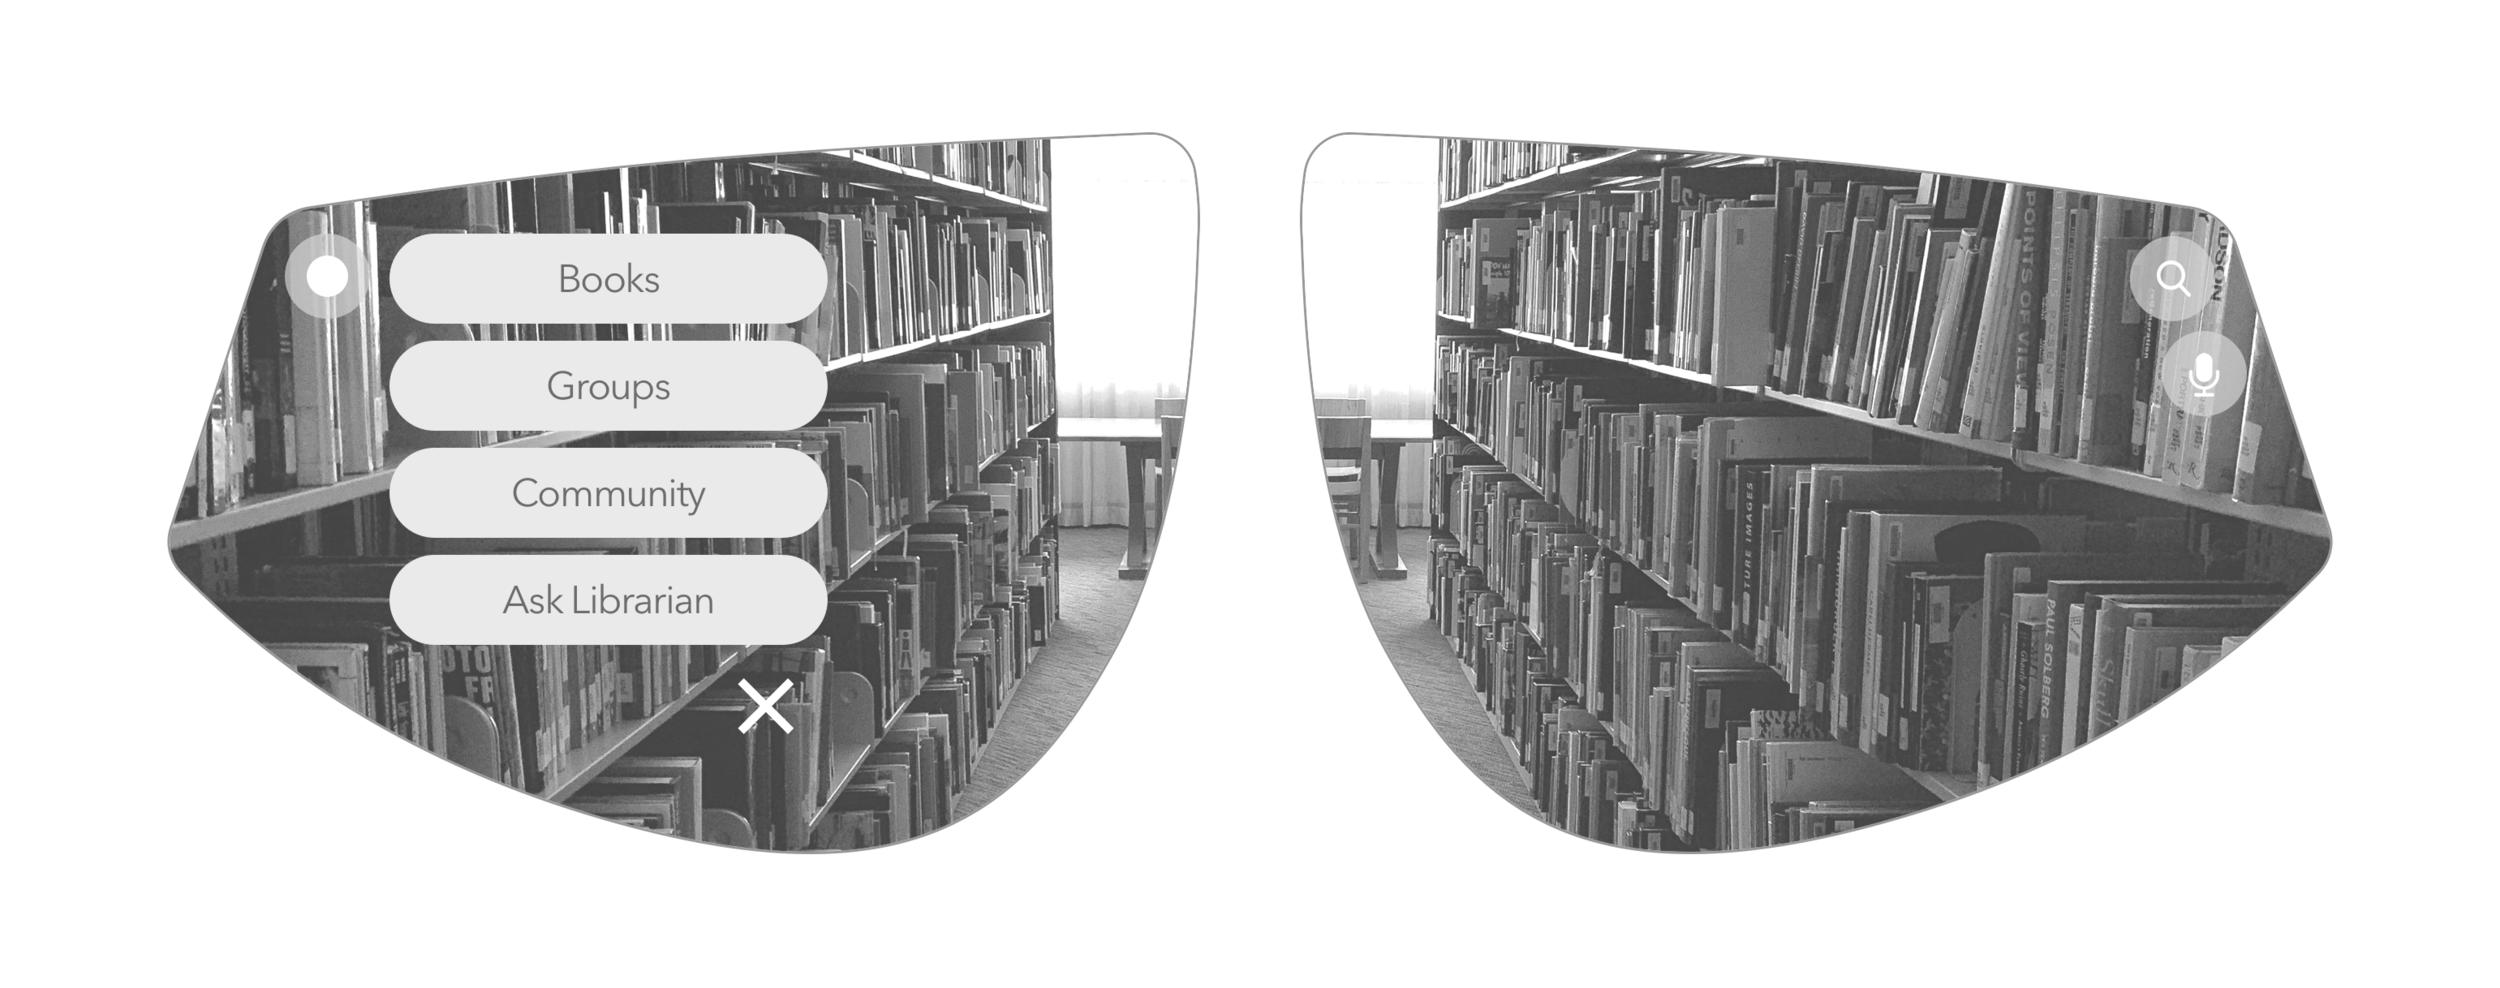 AR Glasses - Search